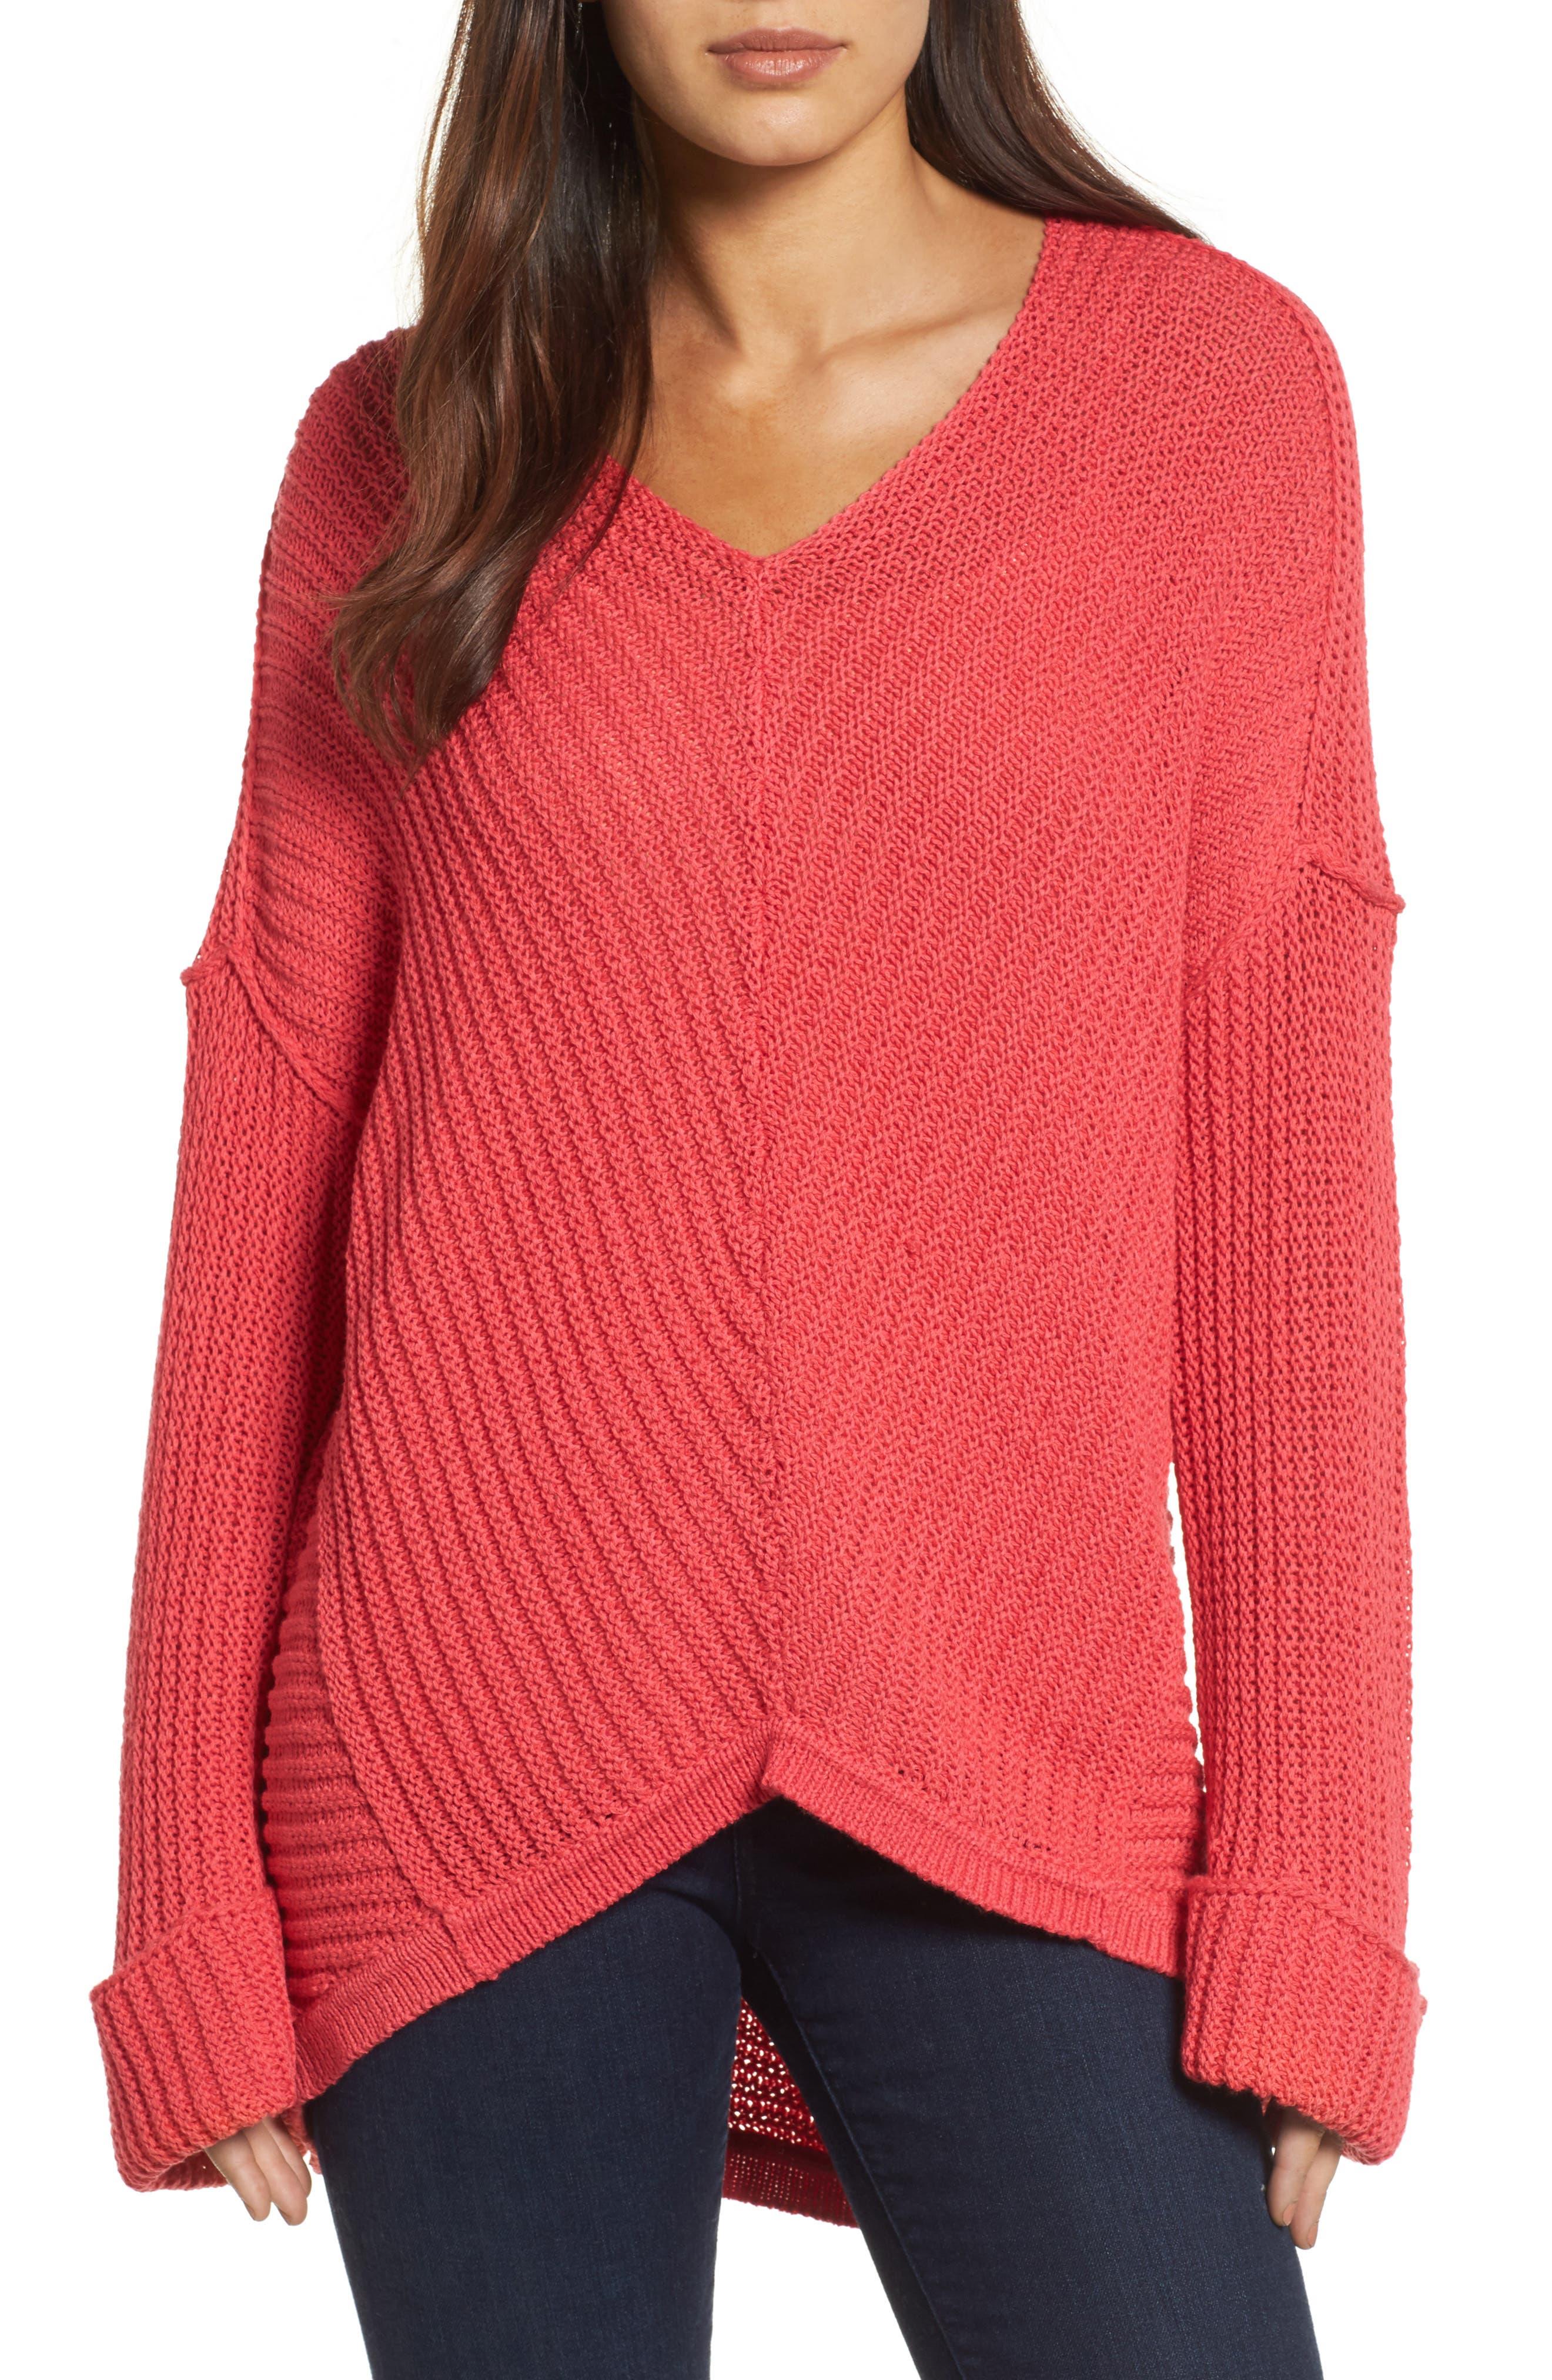 Main Image - Caslon® Cuffed Sleeve Sweater (Regular & Petite)